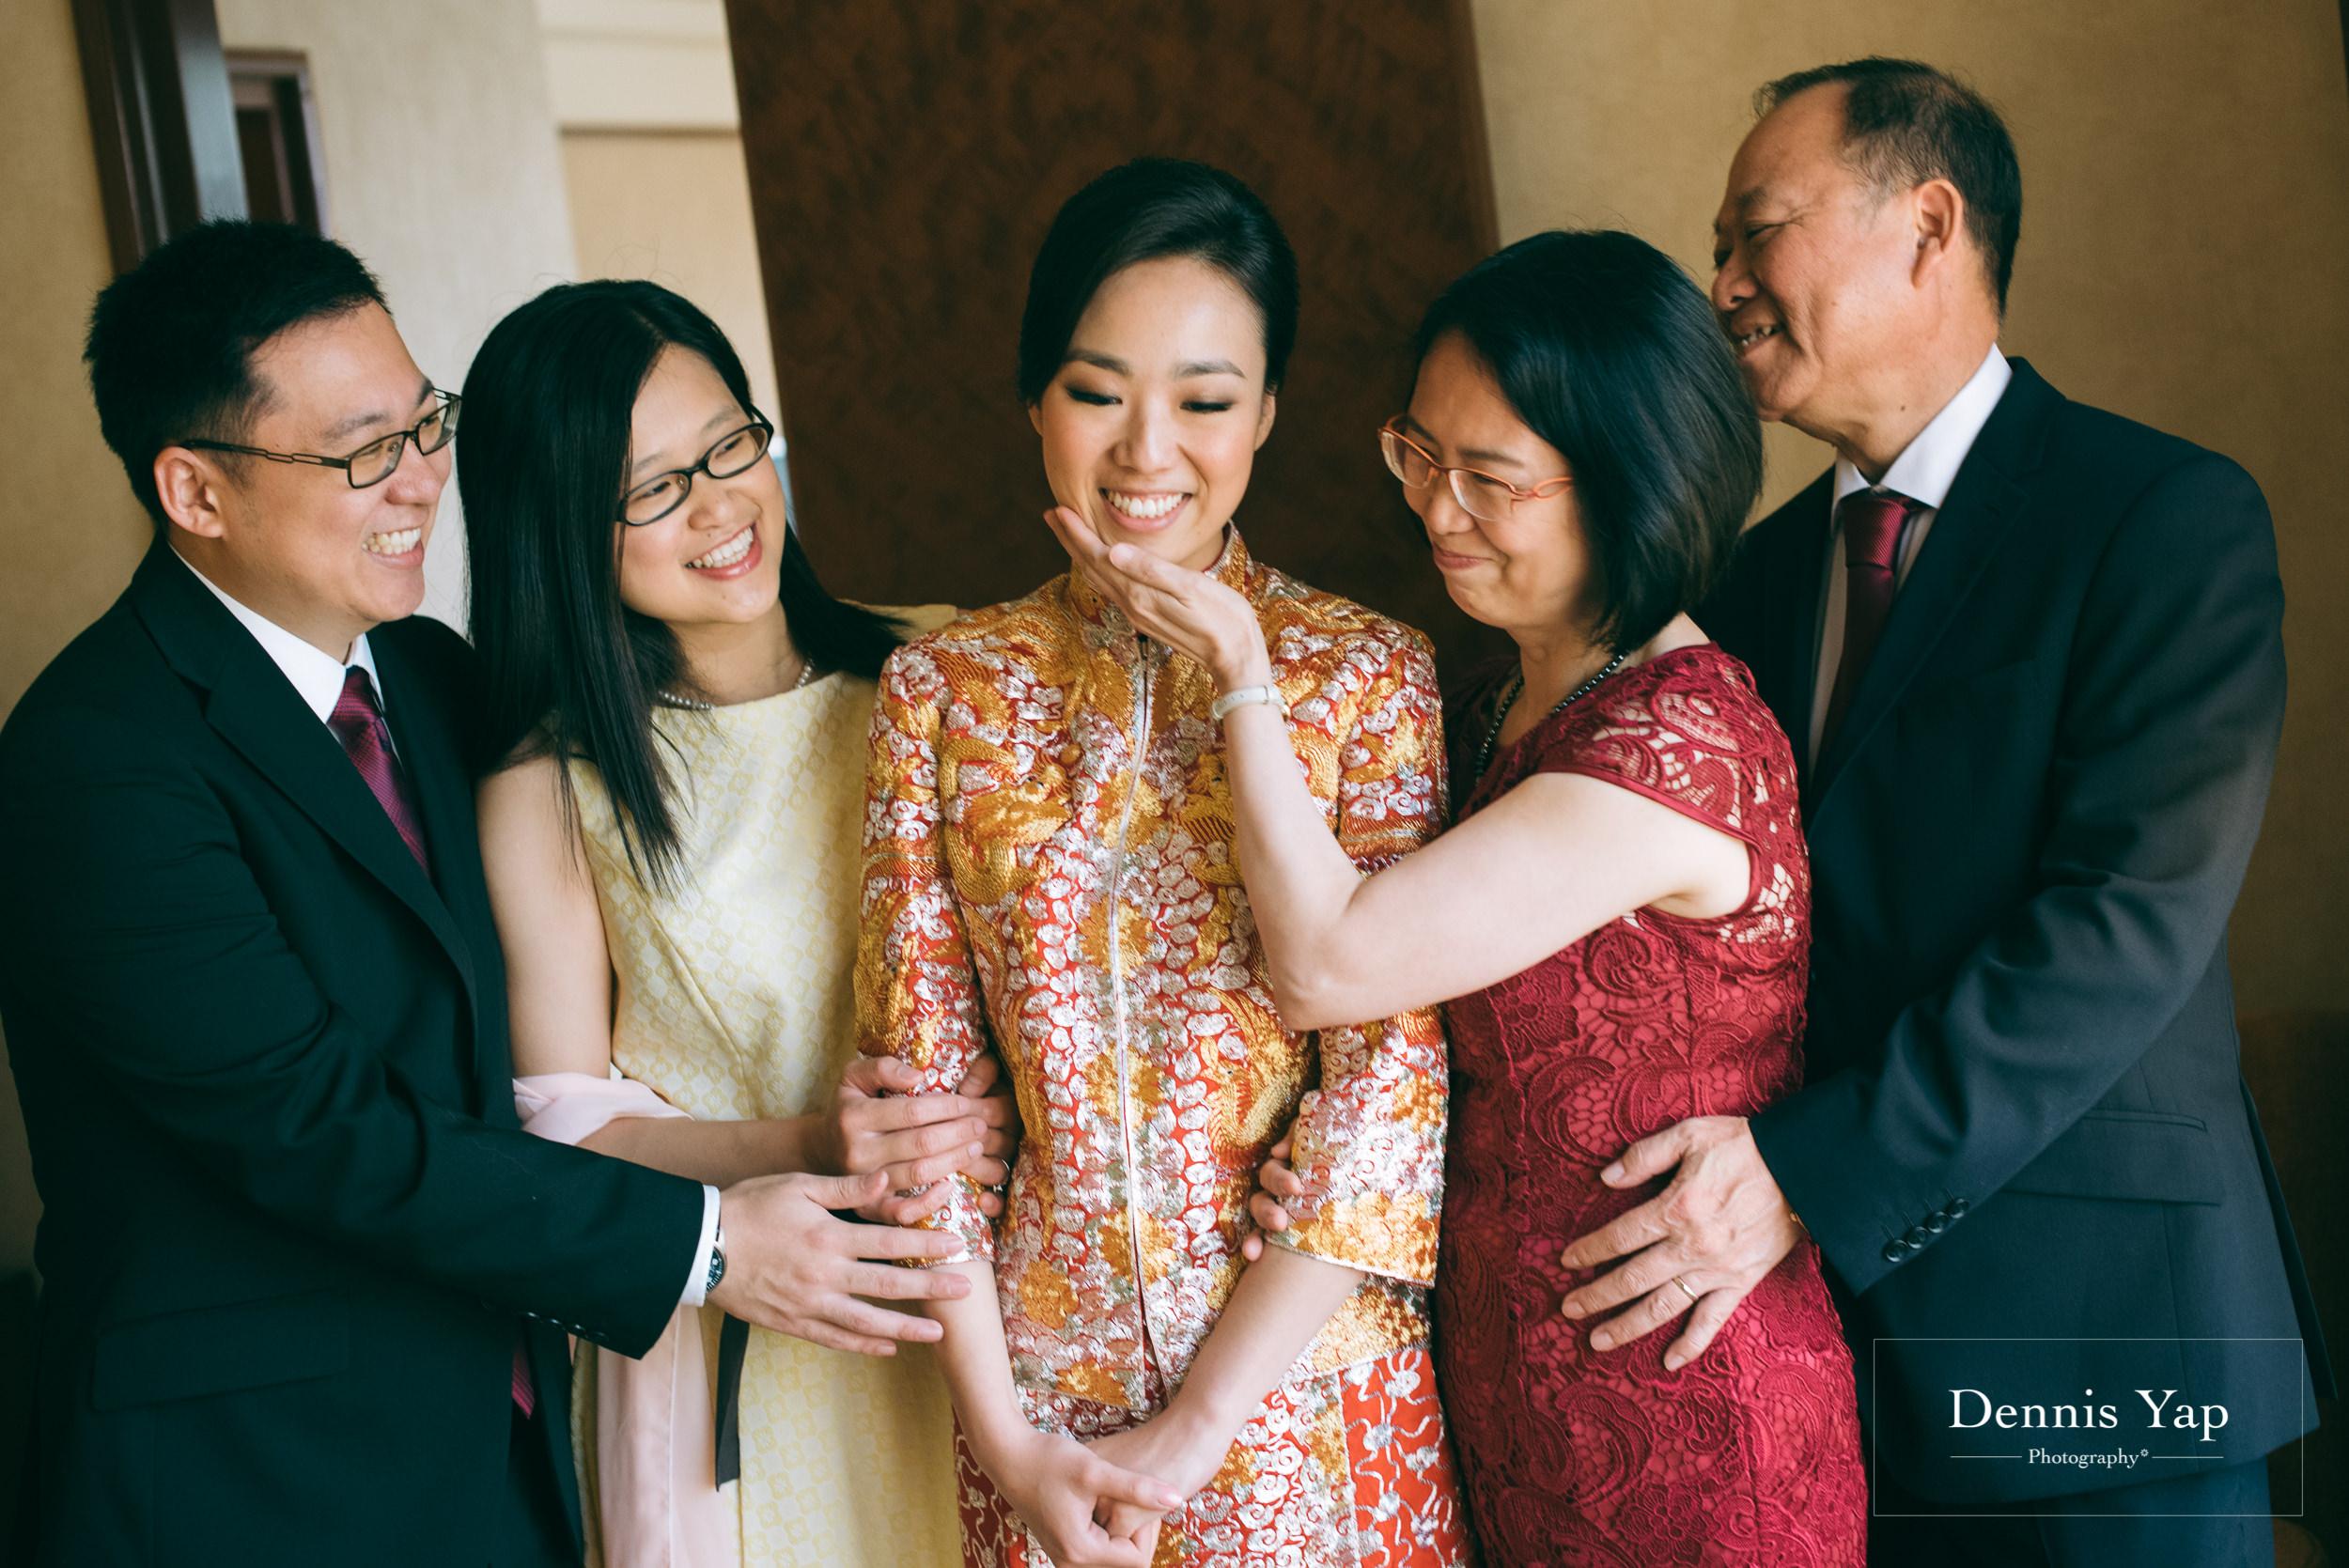 wai keong jenny wedding day bangsar dennis yap photography emotions beloved family-8.jpg